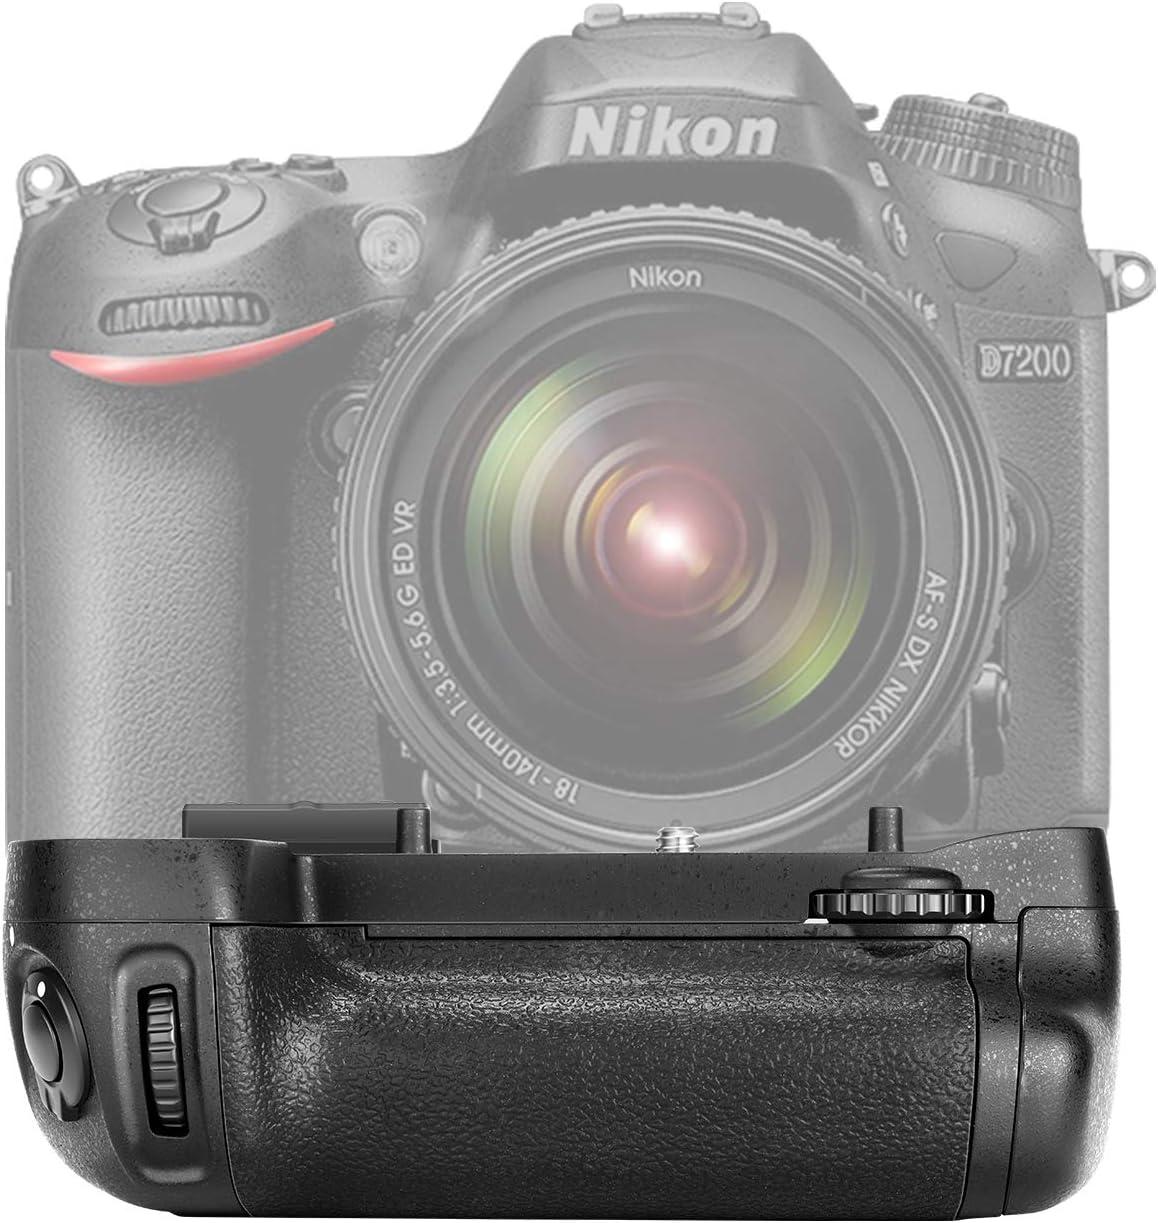 Grip de bateria para  Nikon D7100 D7200 Digital SLR Camara